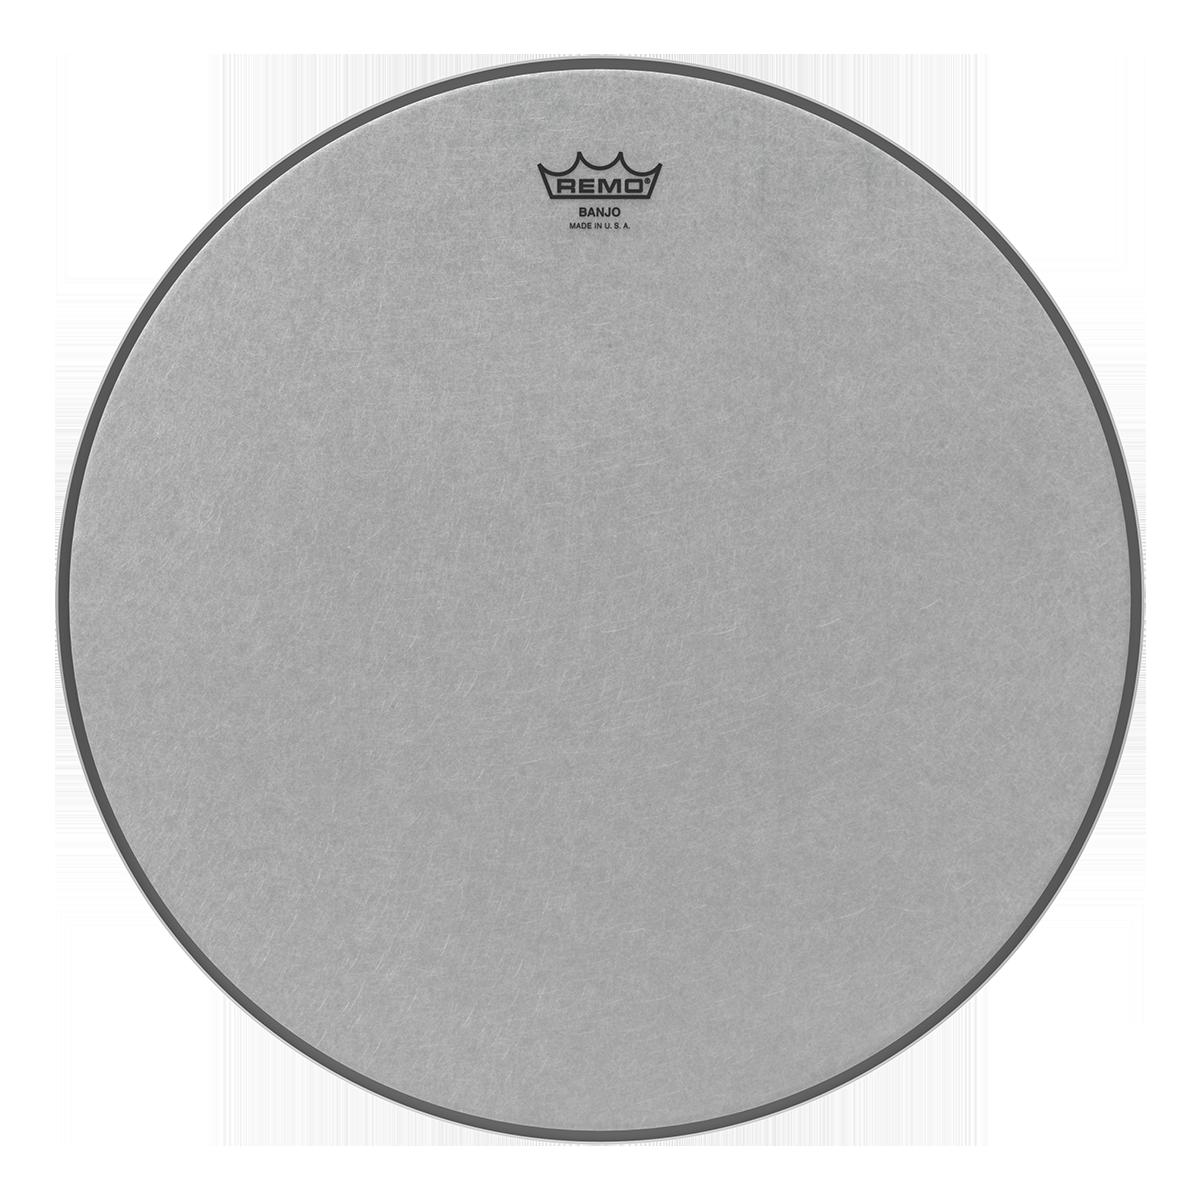 "BJ-1100-M5 Medium Collar 3 Banjo Head Remo 11/"" Fiberskyn R"